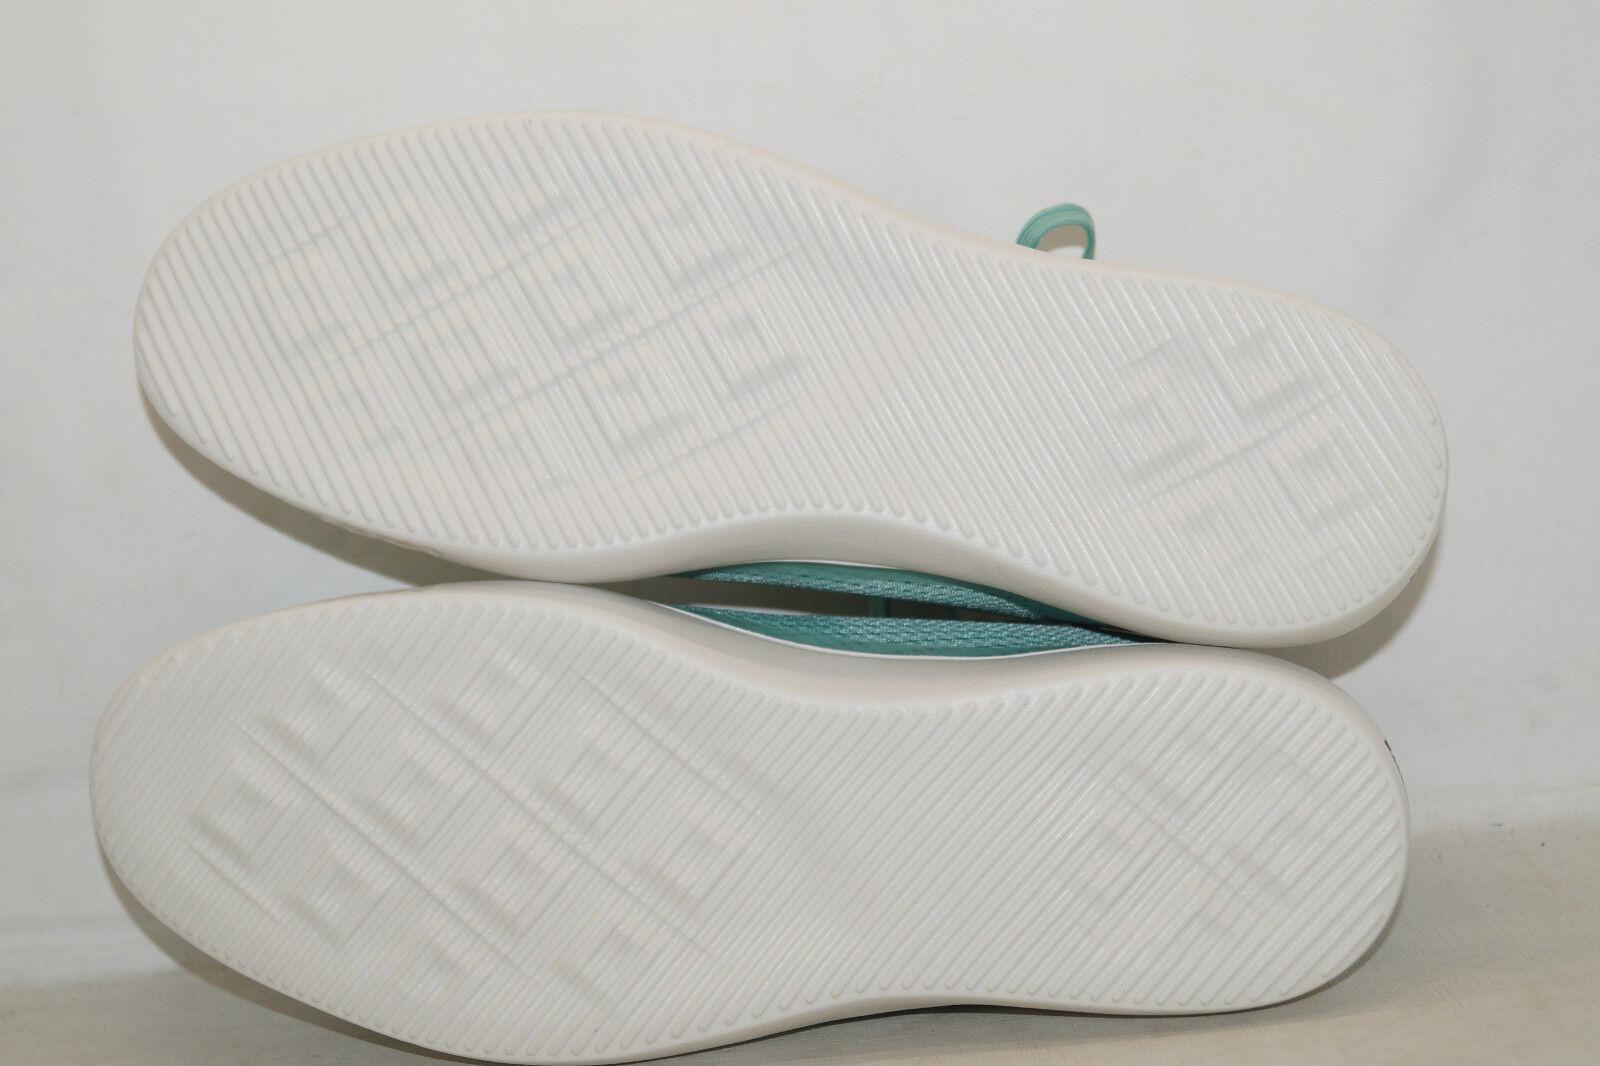 CONVERSE CHUCKS Mesh ALL STAR LOW clean Mesh CHUCKS OX EU.46 UK 10.5 jade grün 157394C f9a5f9